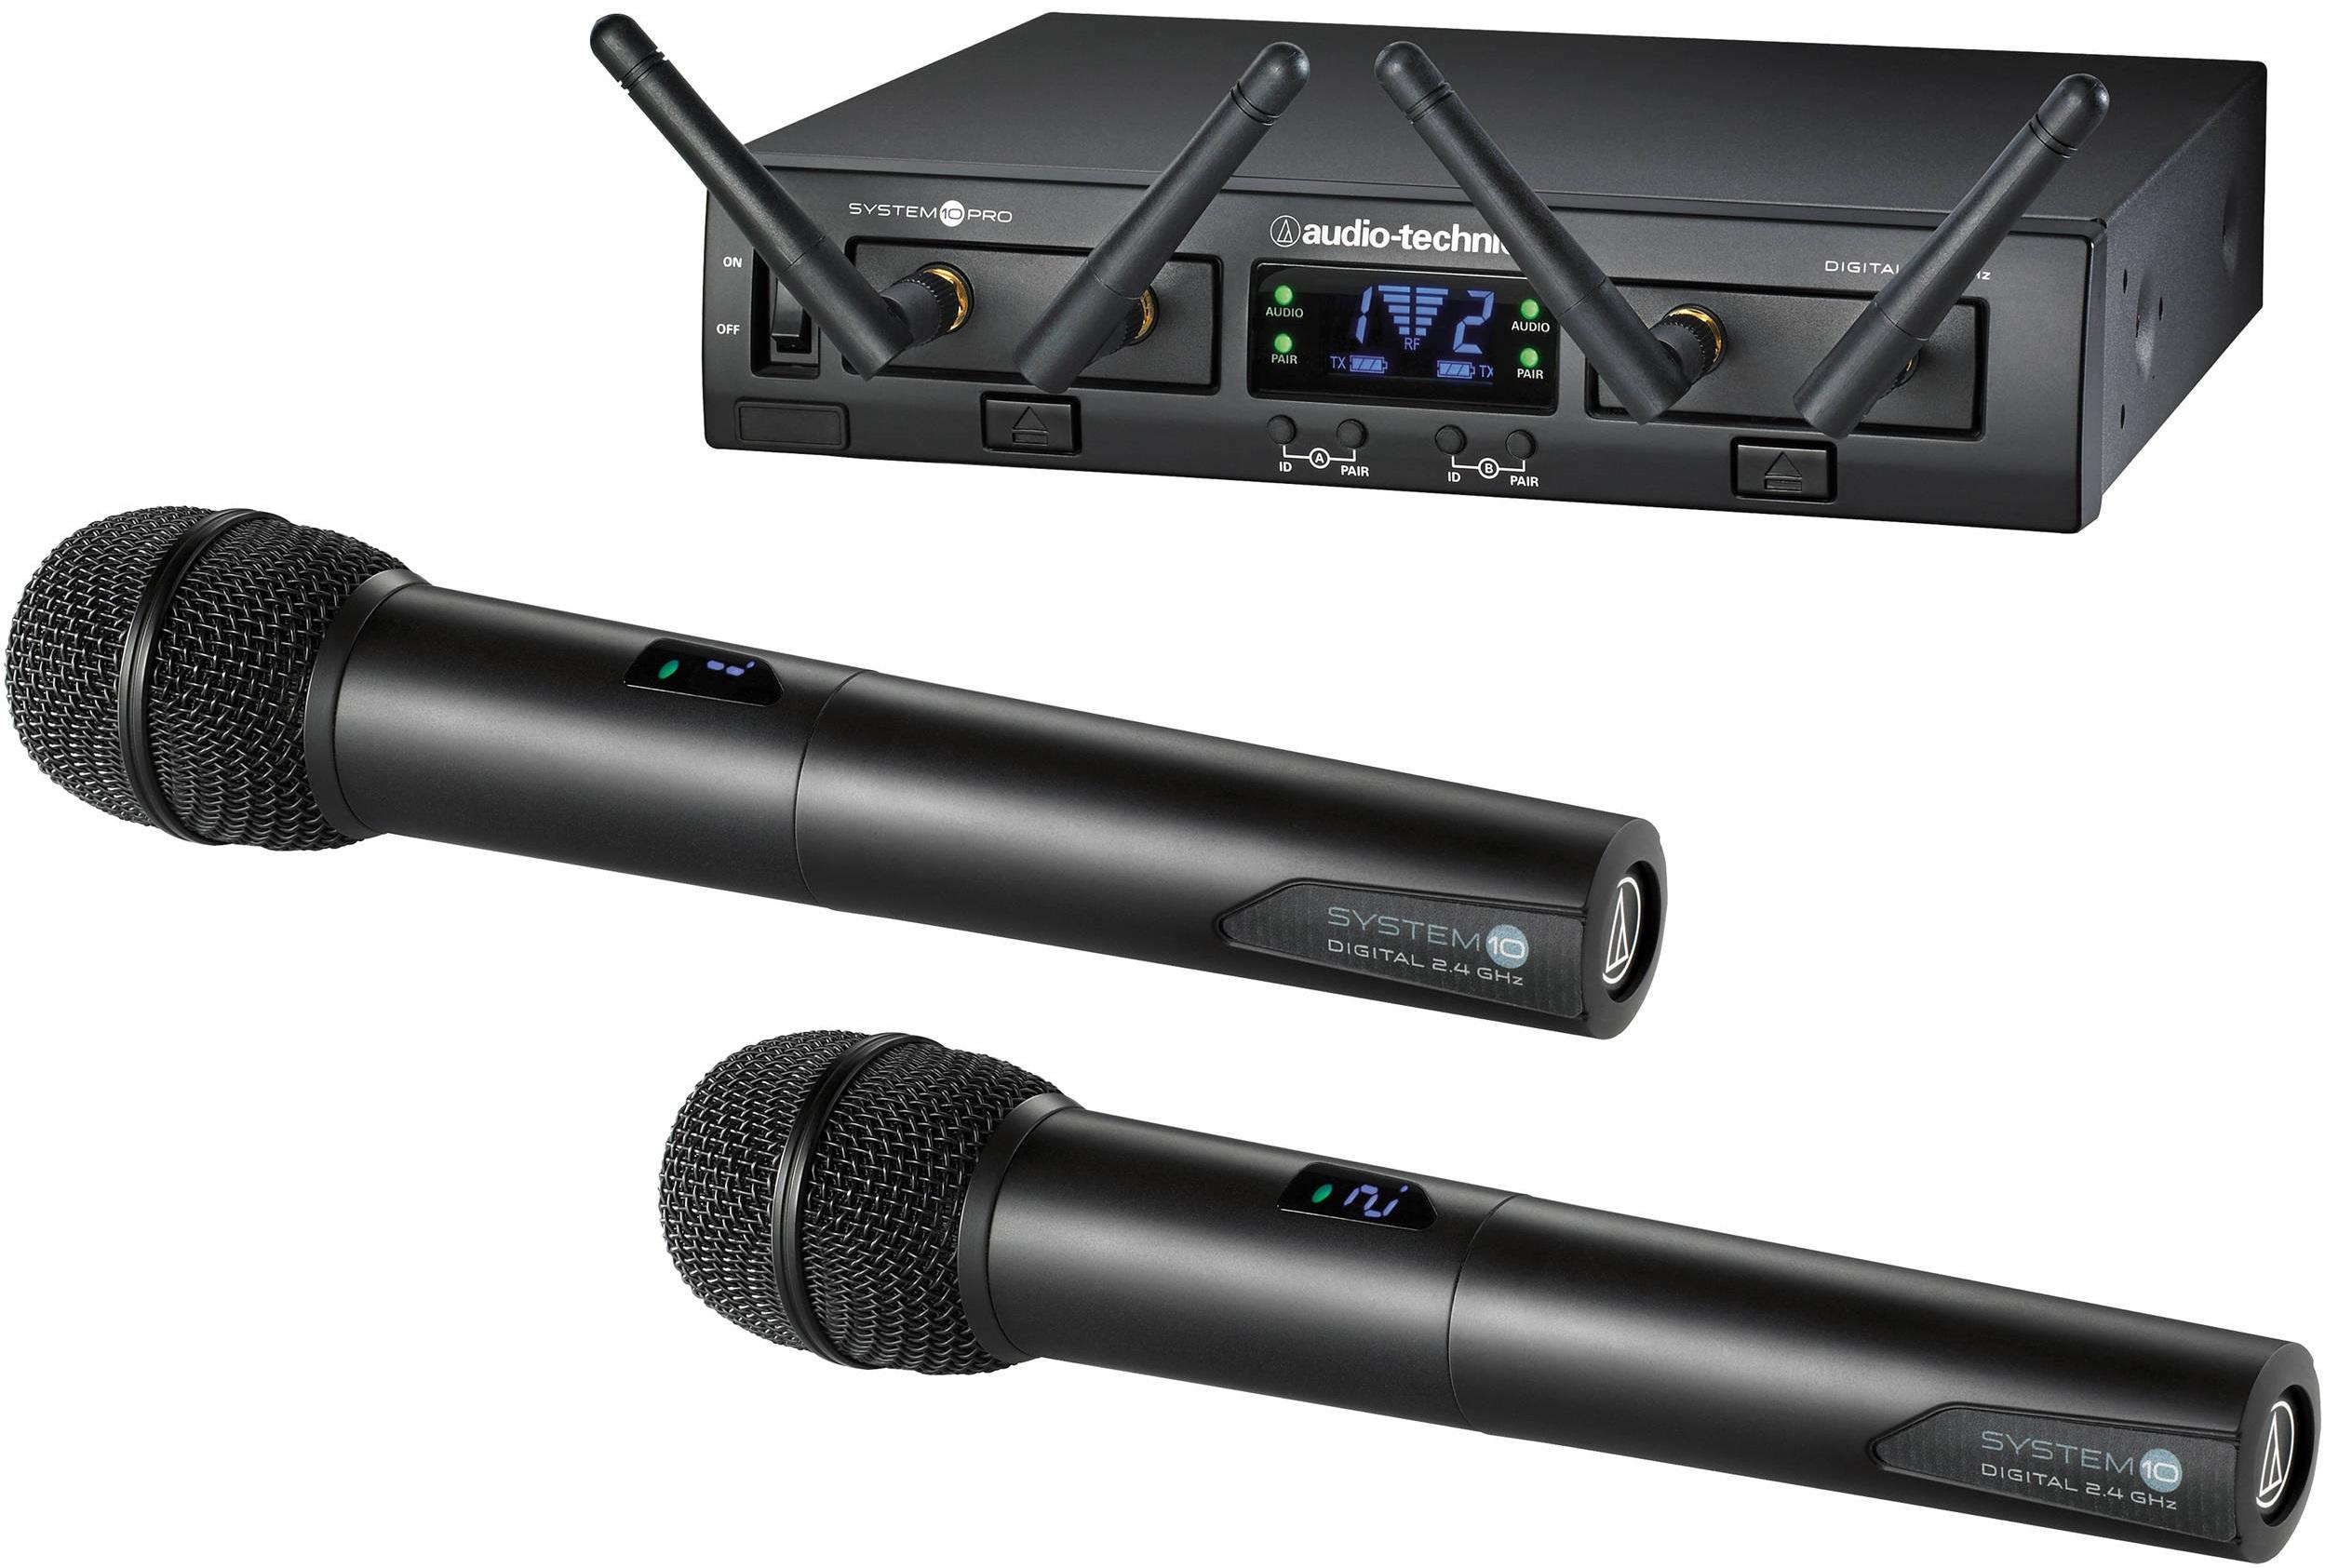 audio-technica-atw-1322-system-10-pro-dual-handheld-system-.jpeg